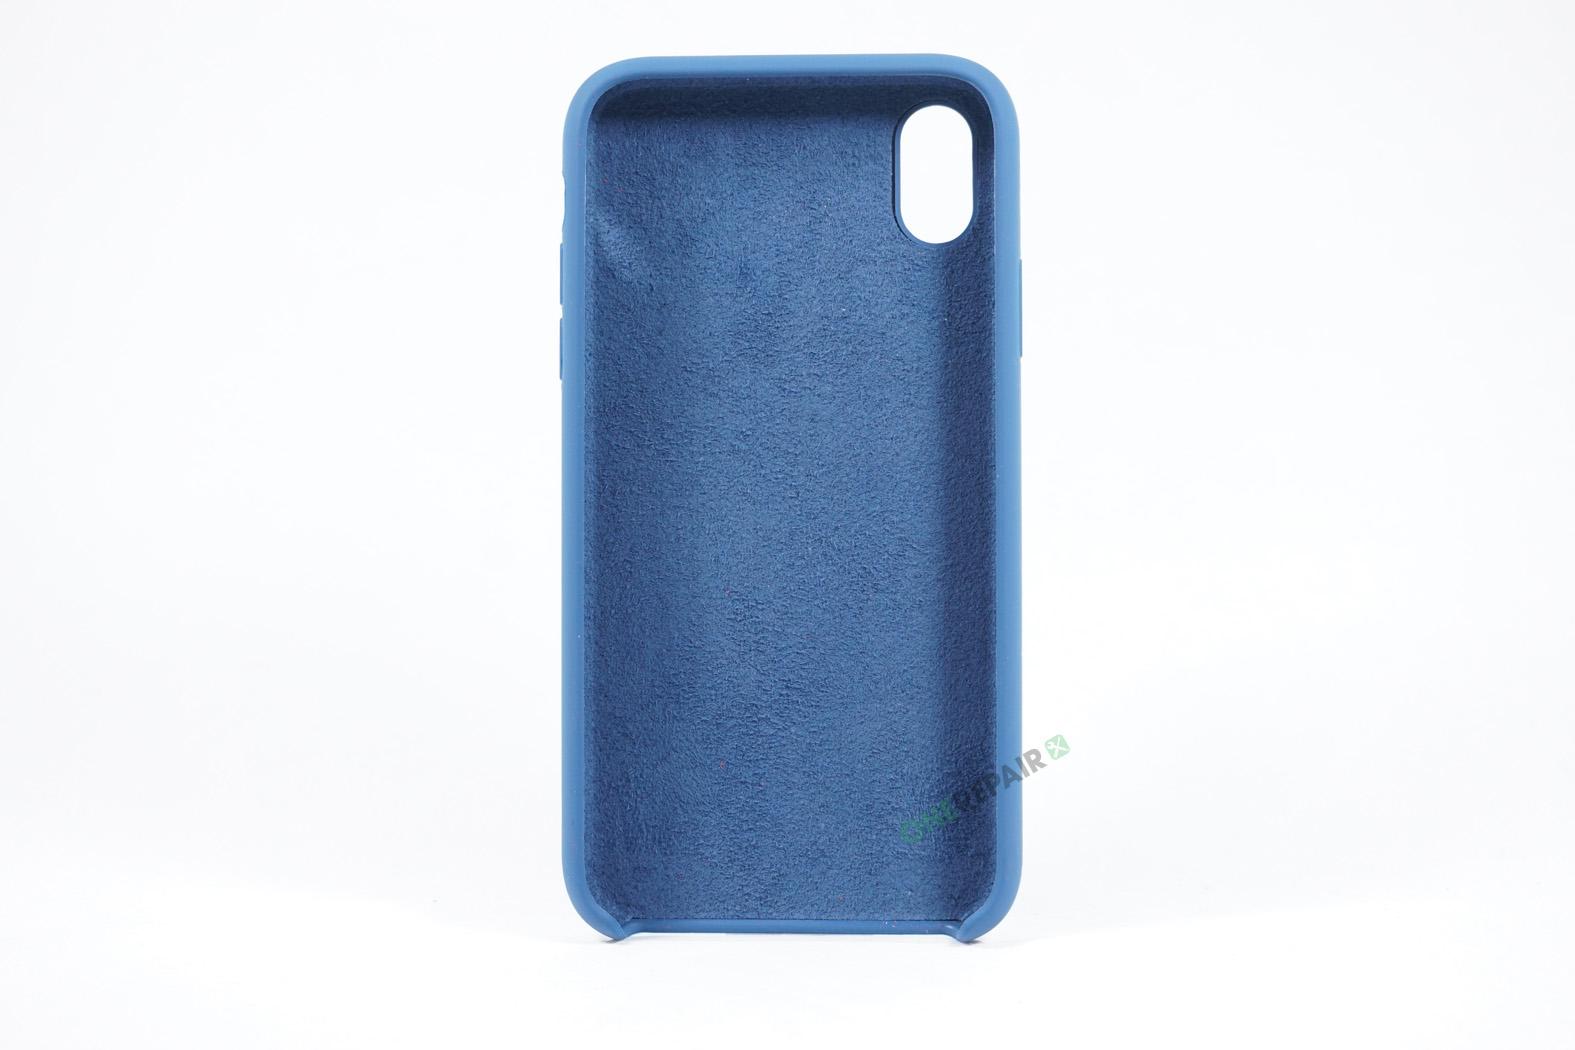 352077_iPhone_XR_Silikonecover_Cover_Blaa_Pastel_Navy_Blue_OneRepair_00003